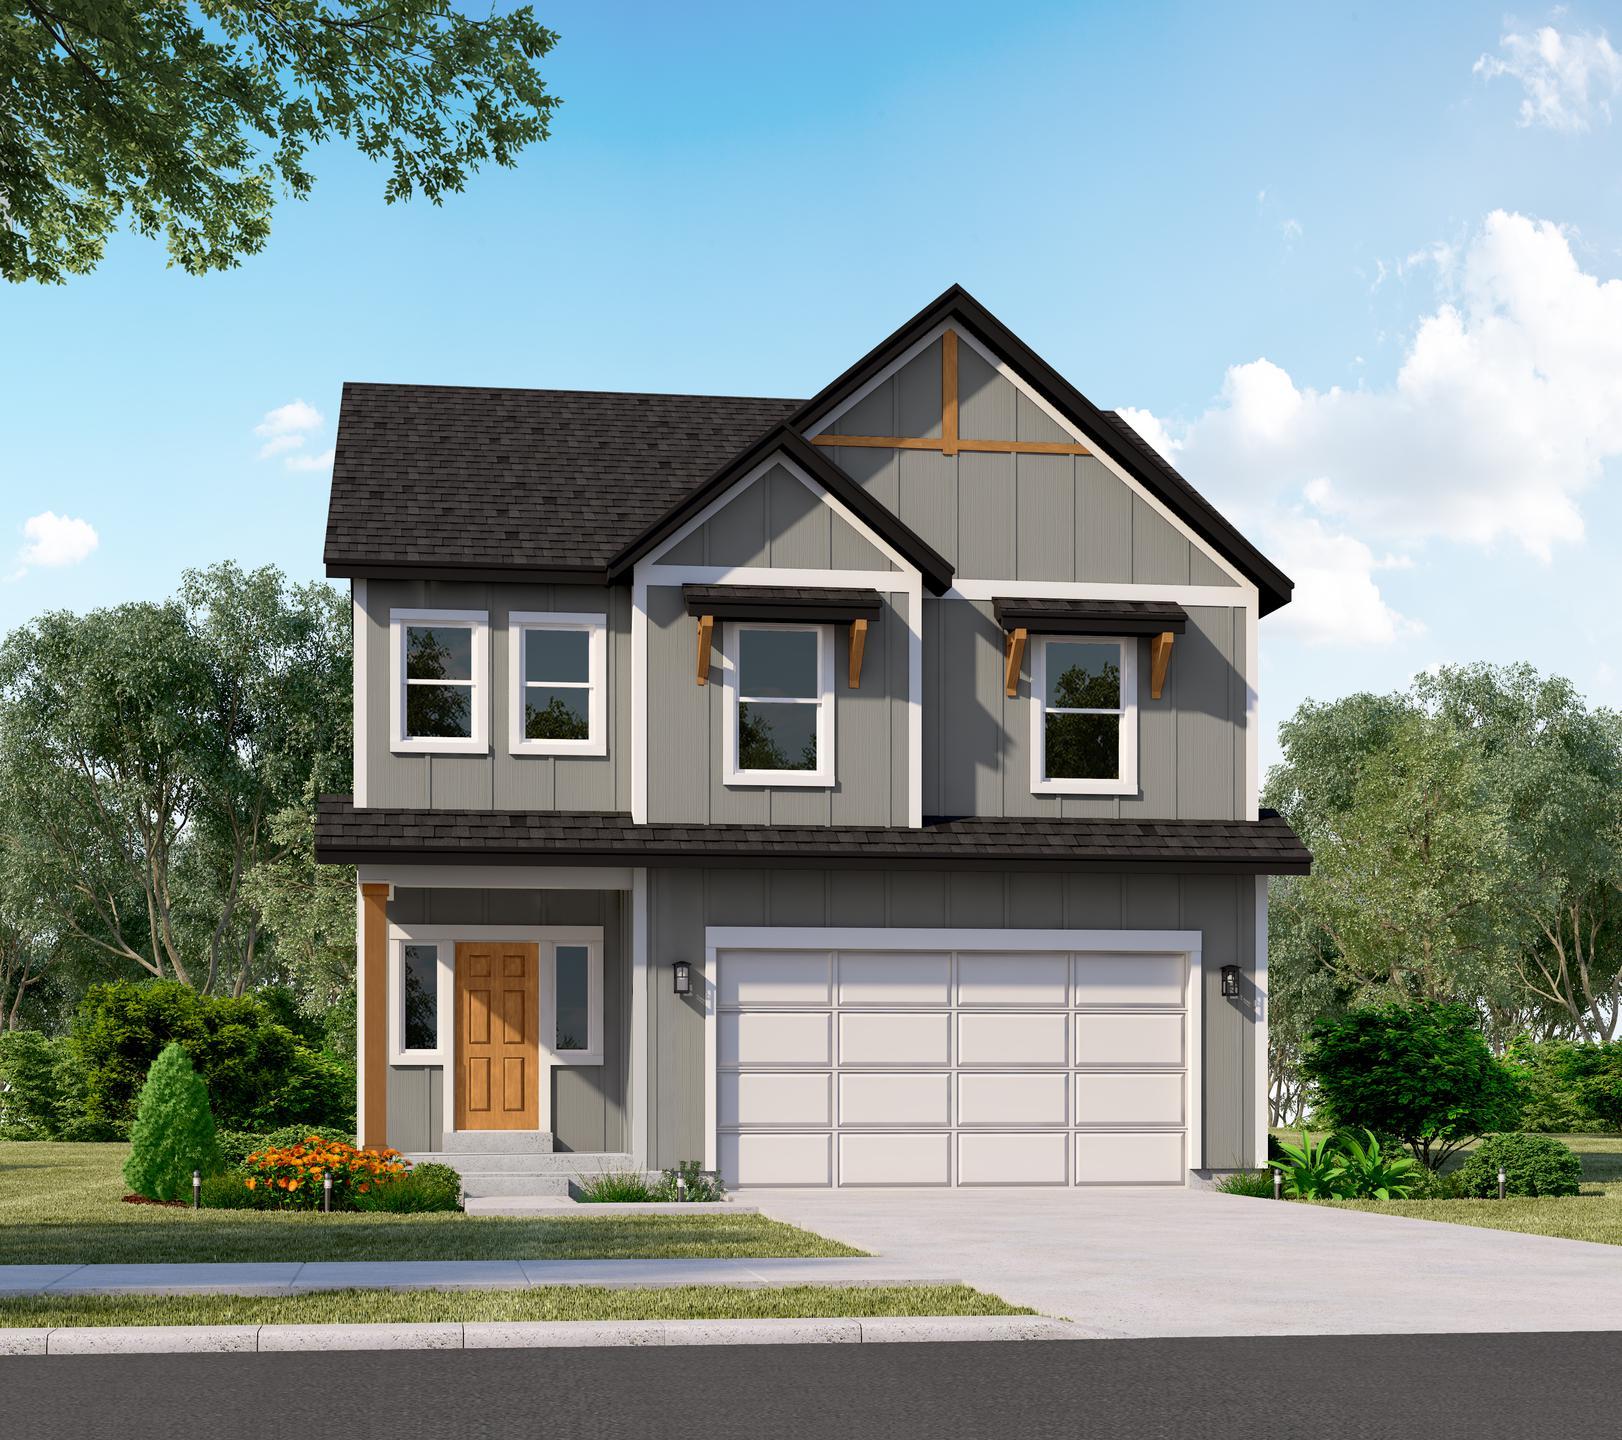 The Stonebridge new home floorplan in Utah